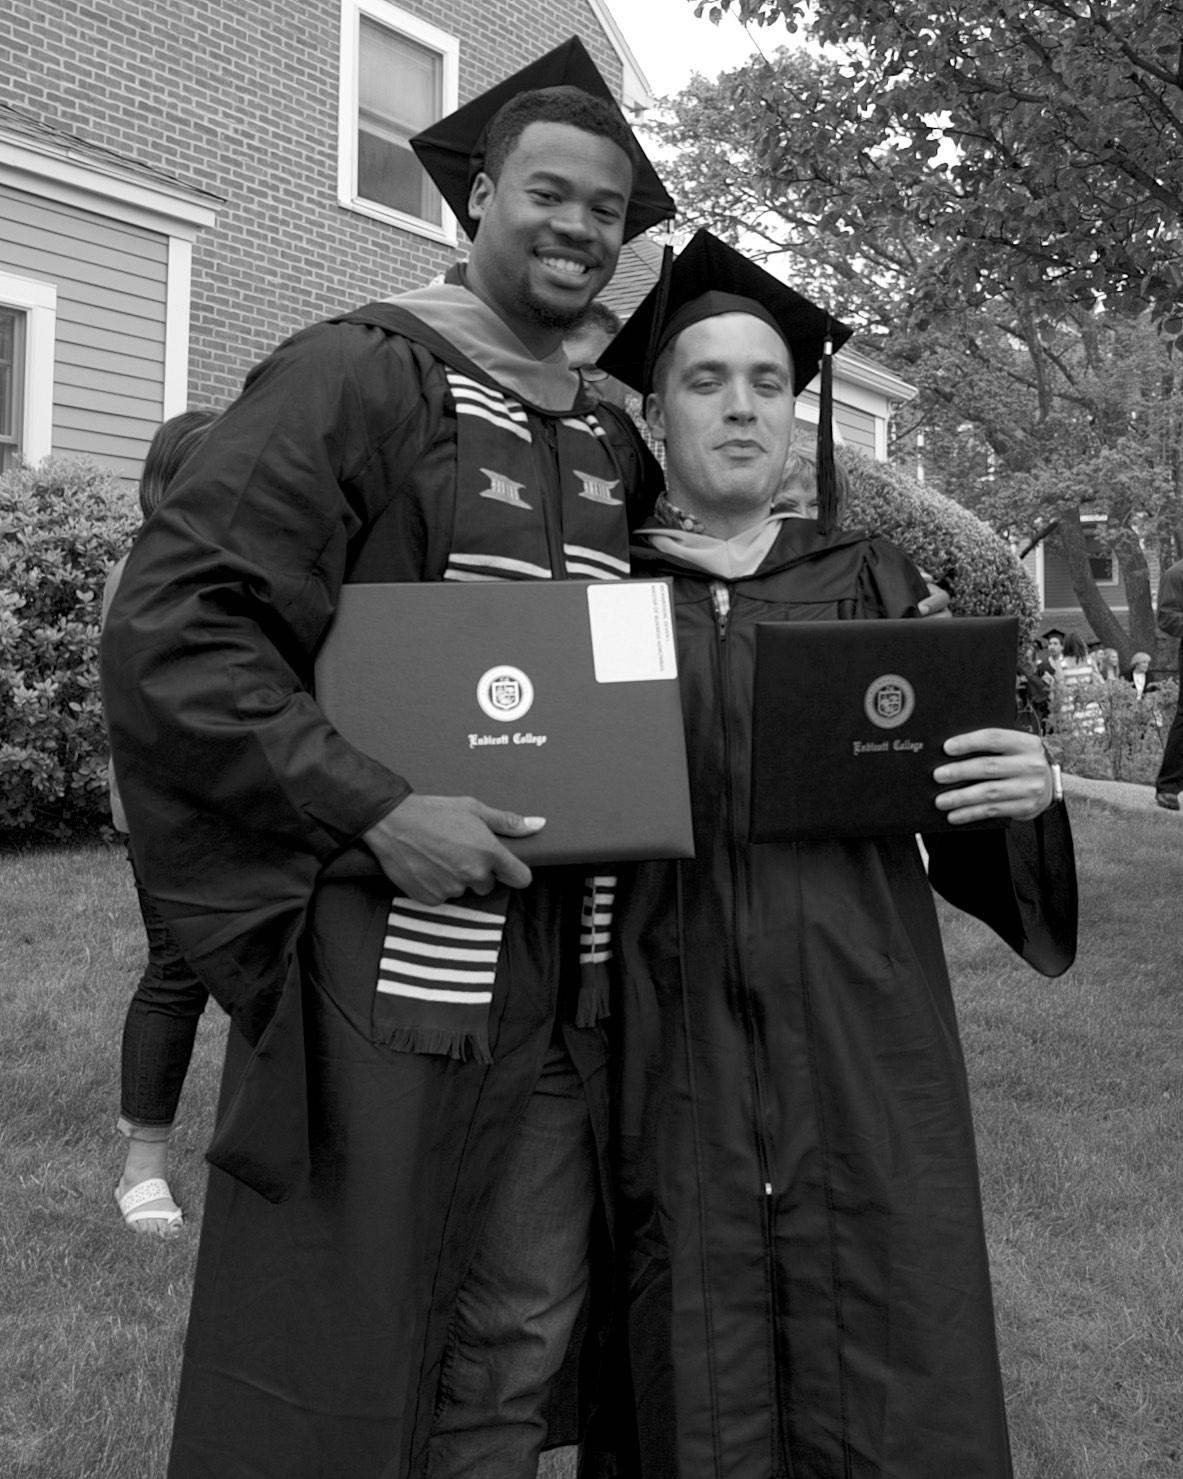 zach_graduation_P5210178.jpg